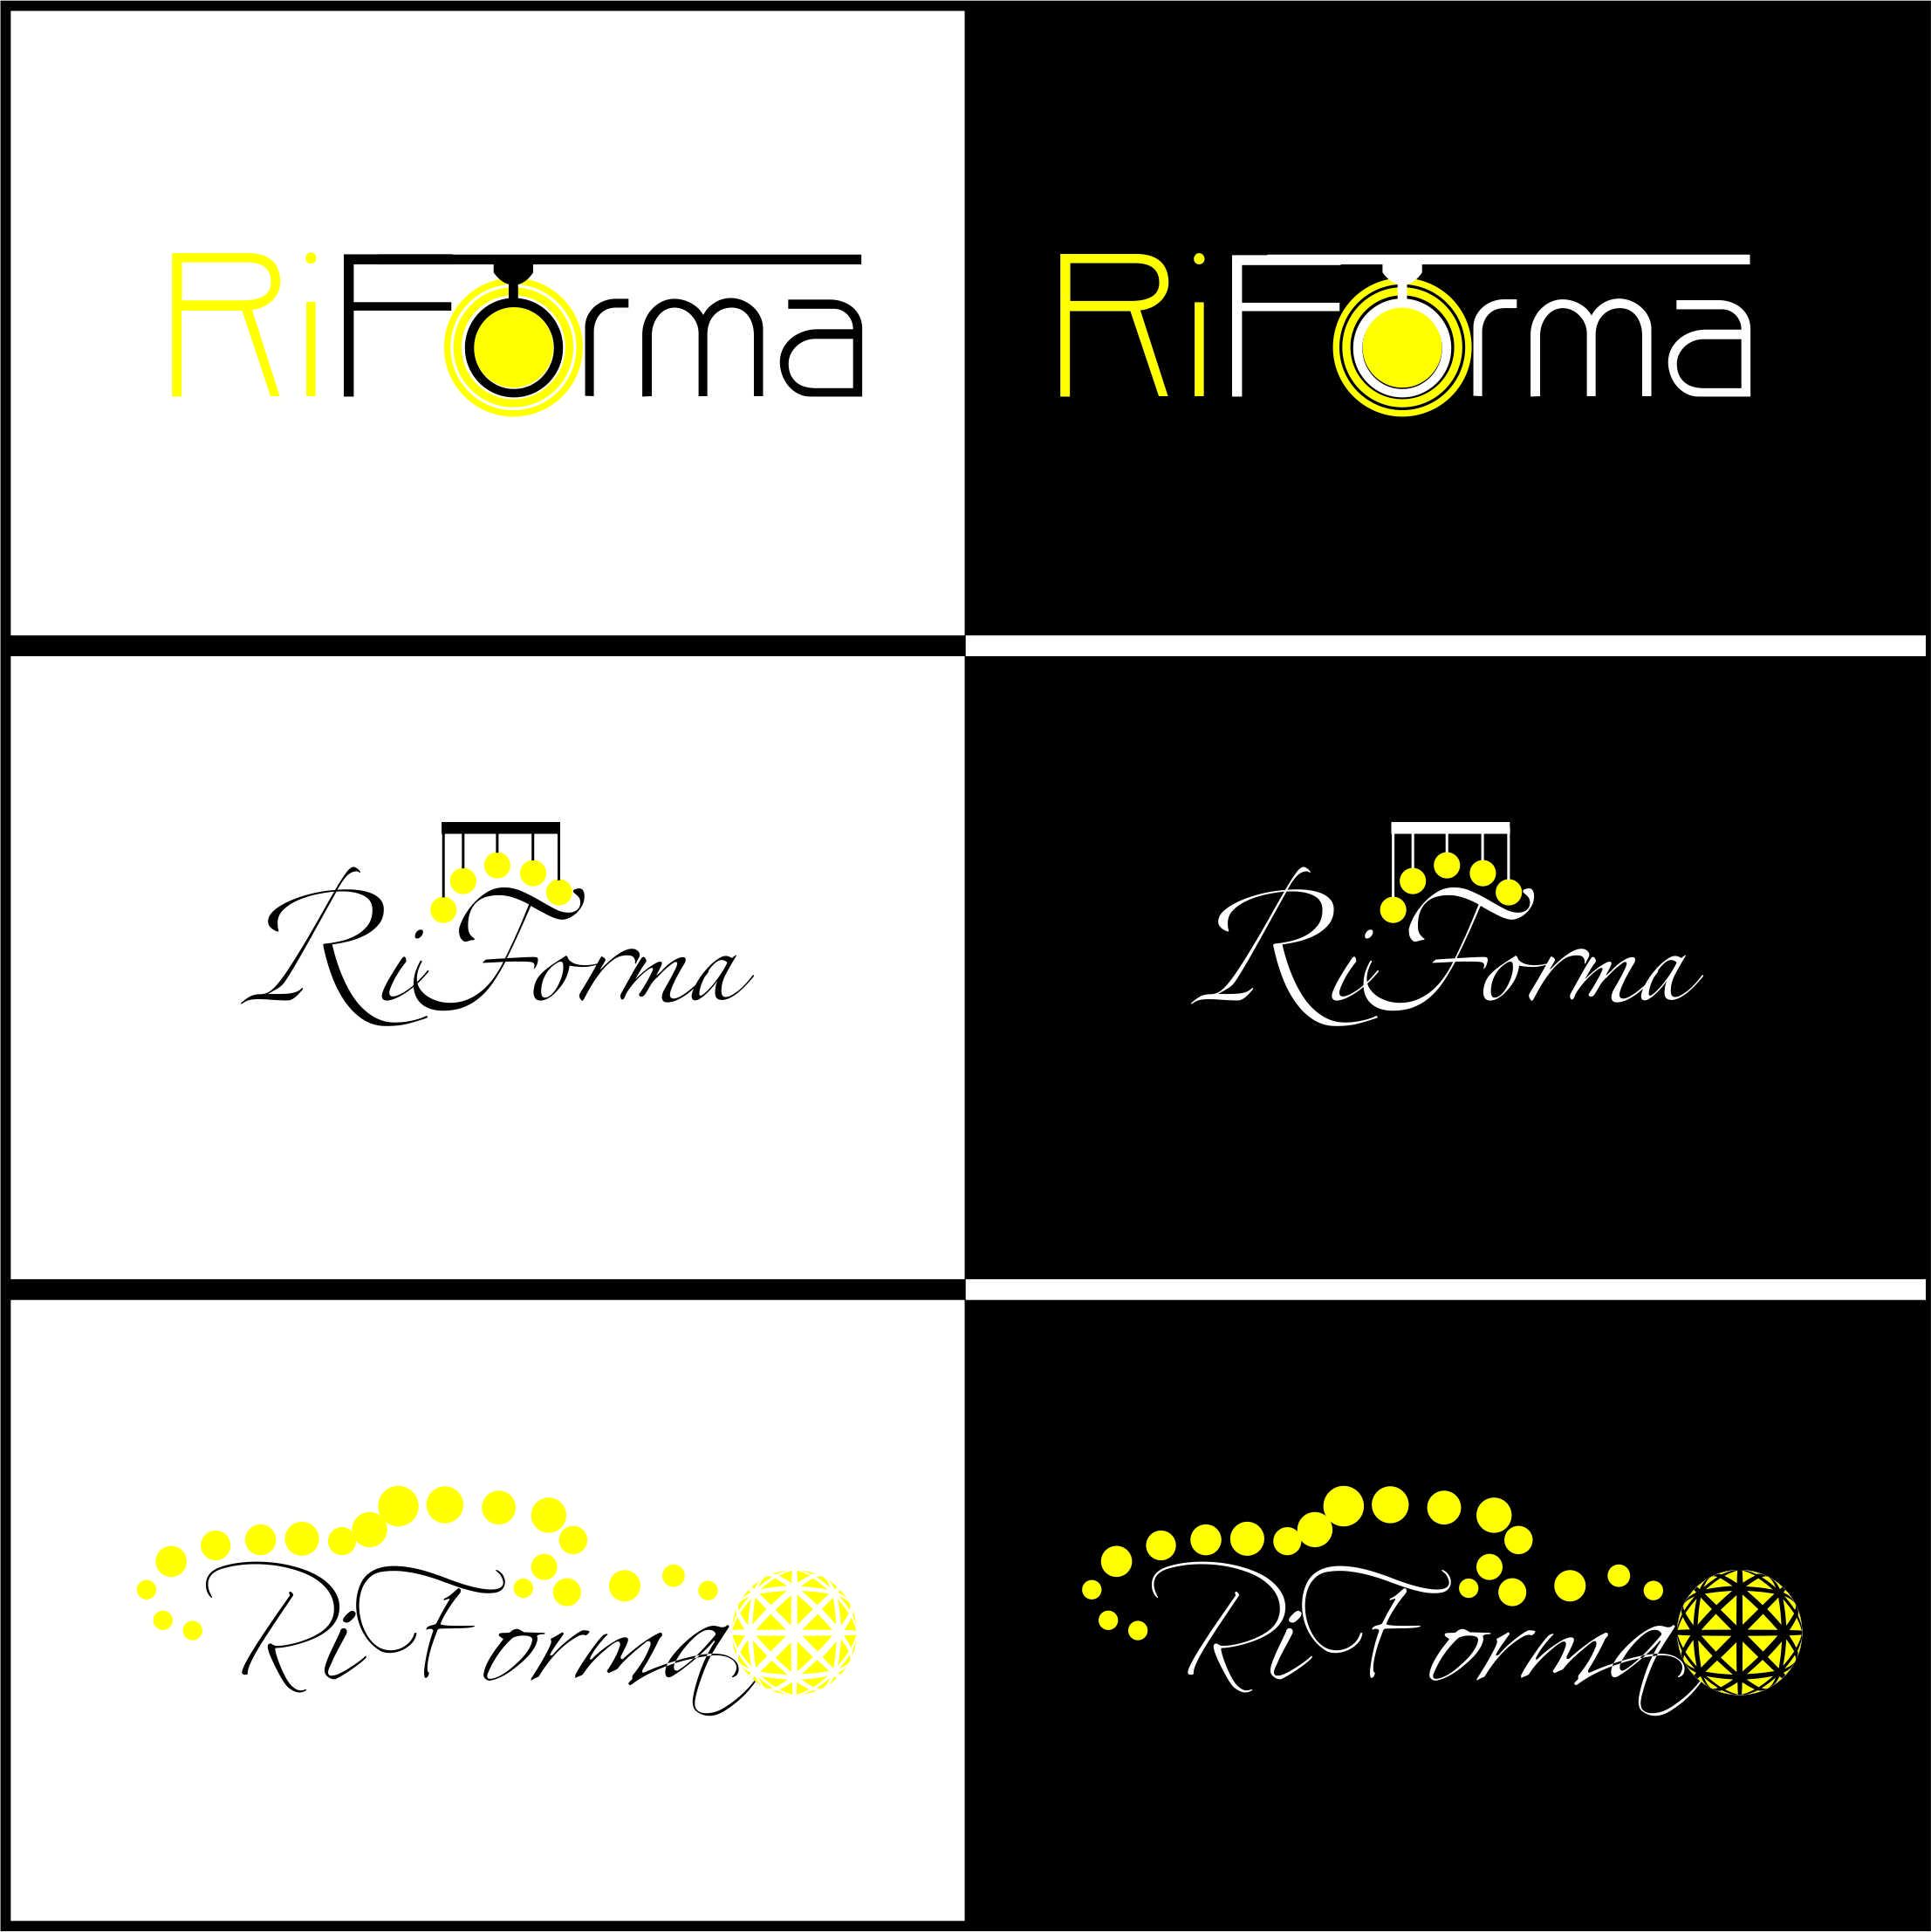 Разработка логотипа и элементов фирменного стиля фото f_17757976dfed1c66.jpg